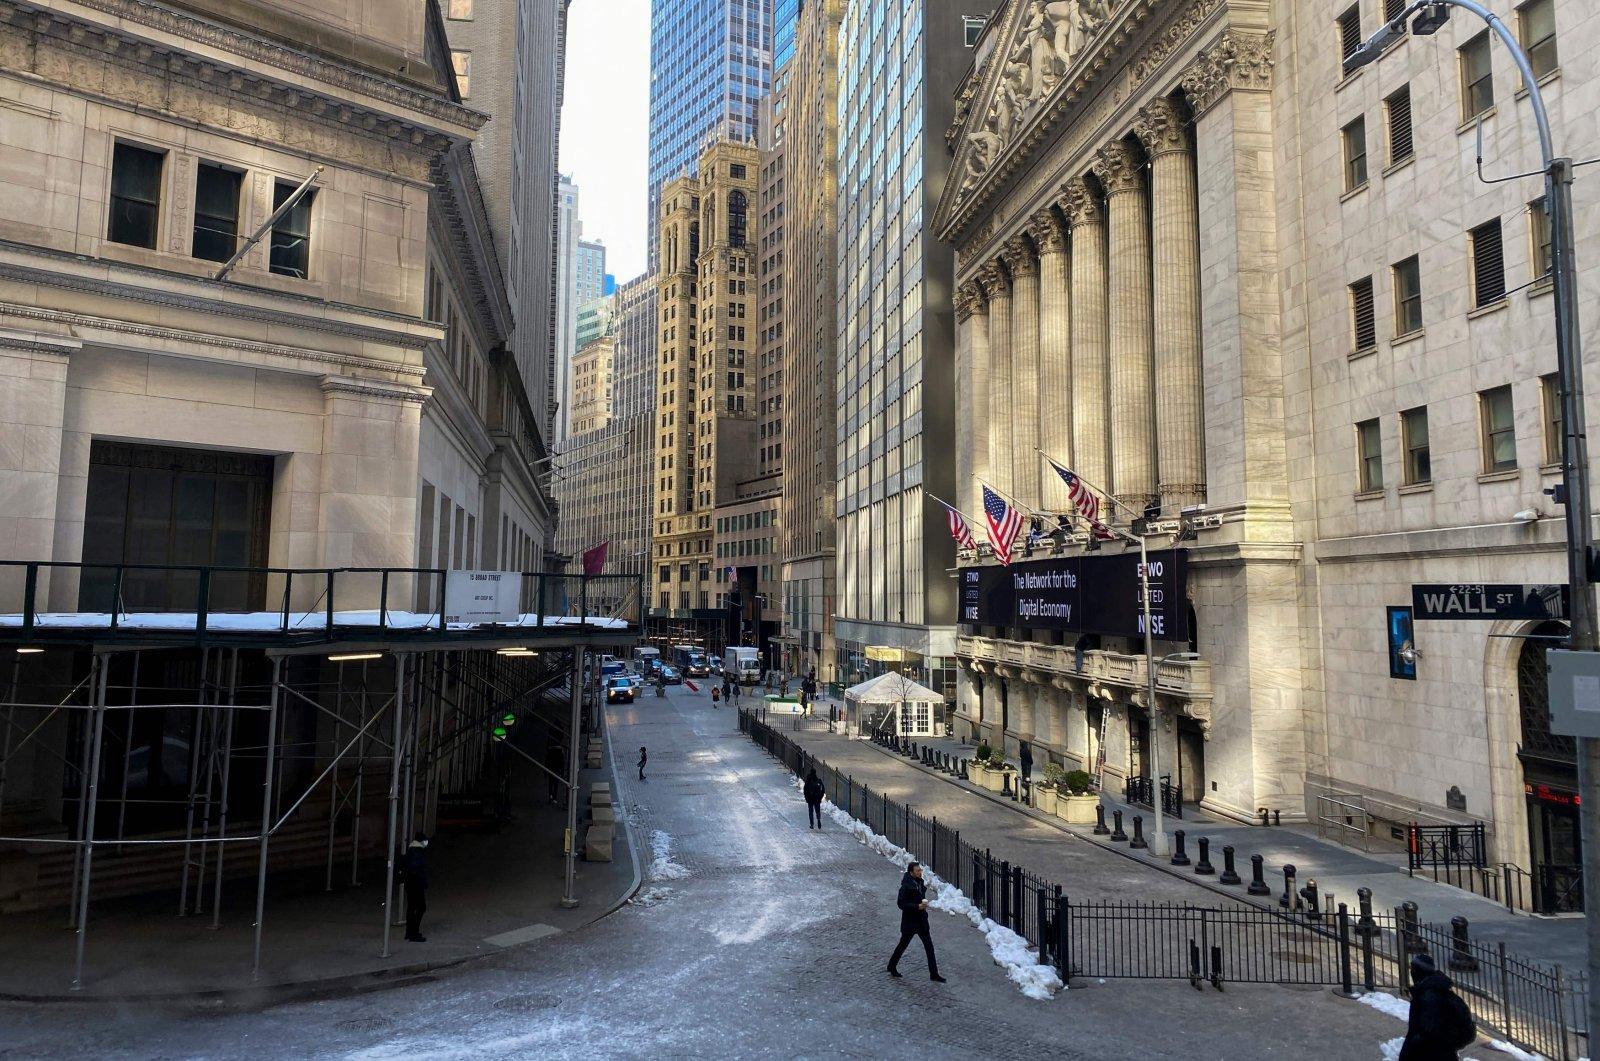 People walk on Wall Street in New York, U.S., Feb. 8, 2021. (AFP Photo)